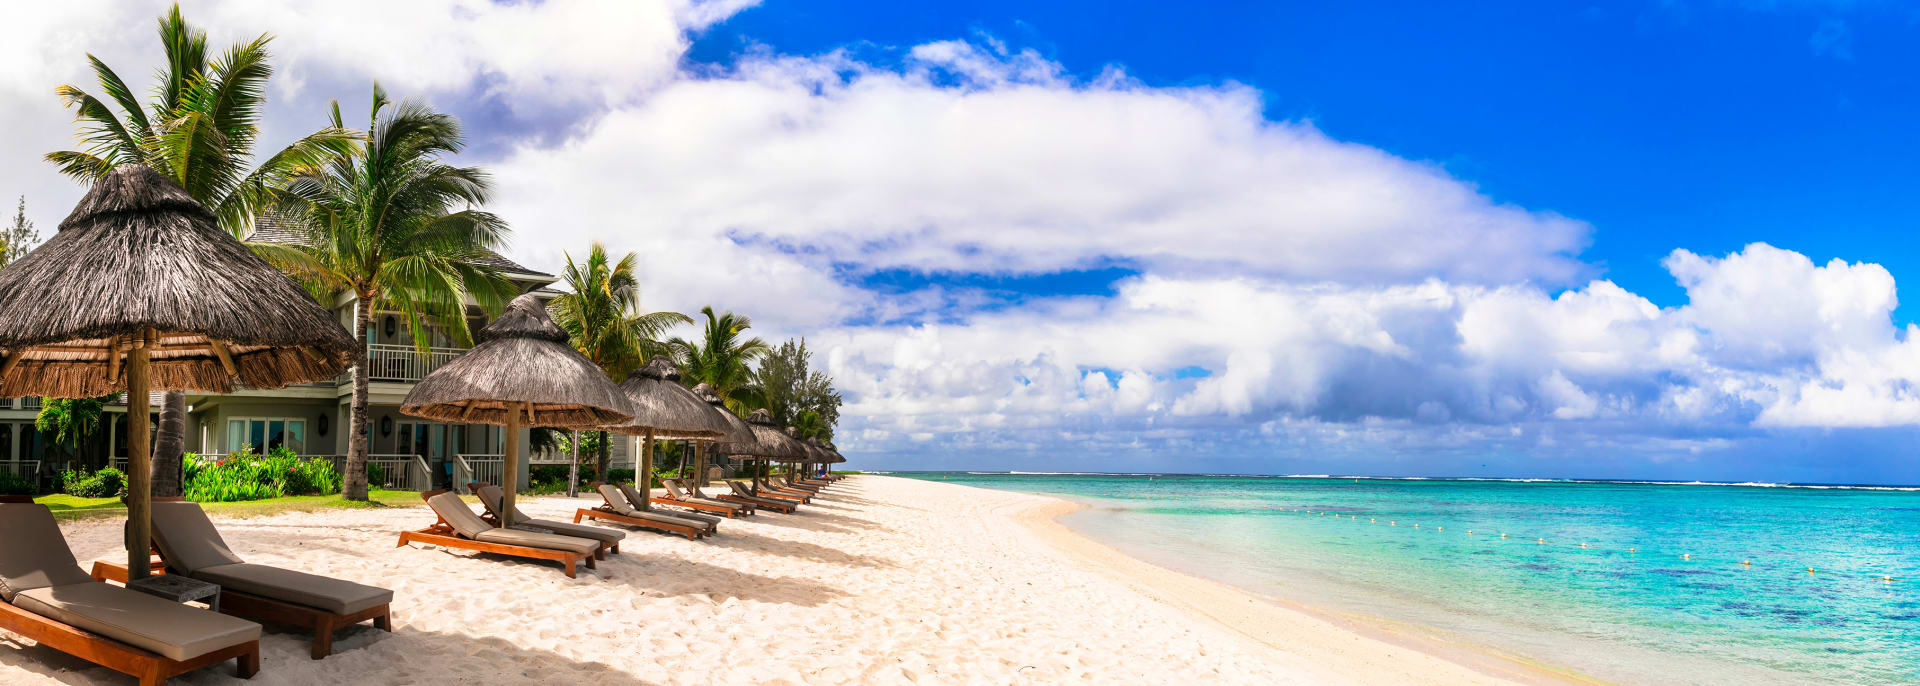 Erstklasse, Mauritius